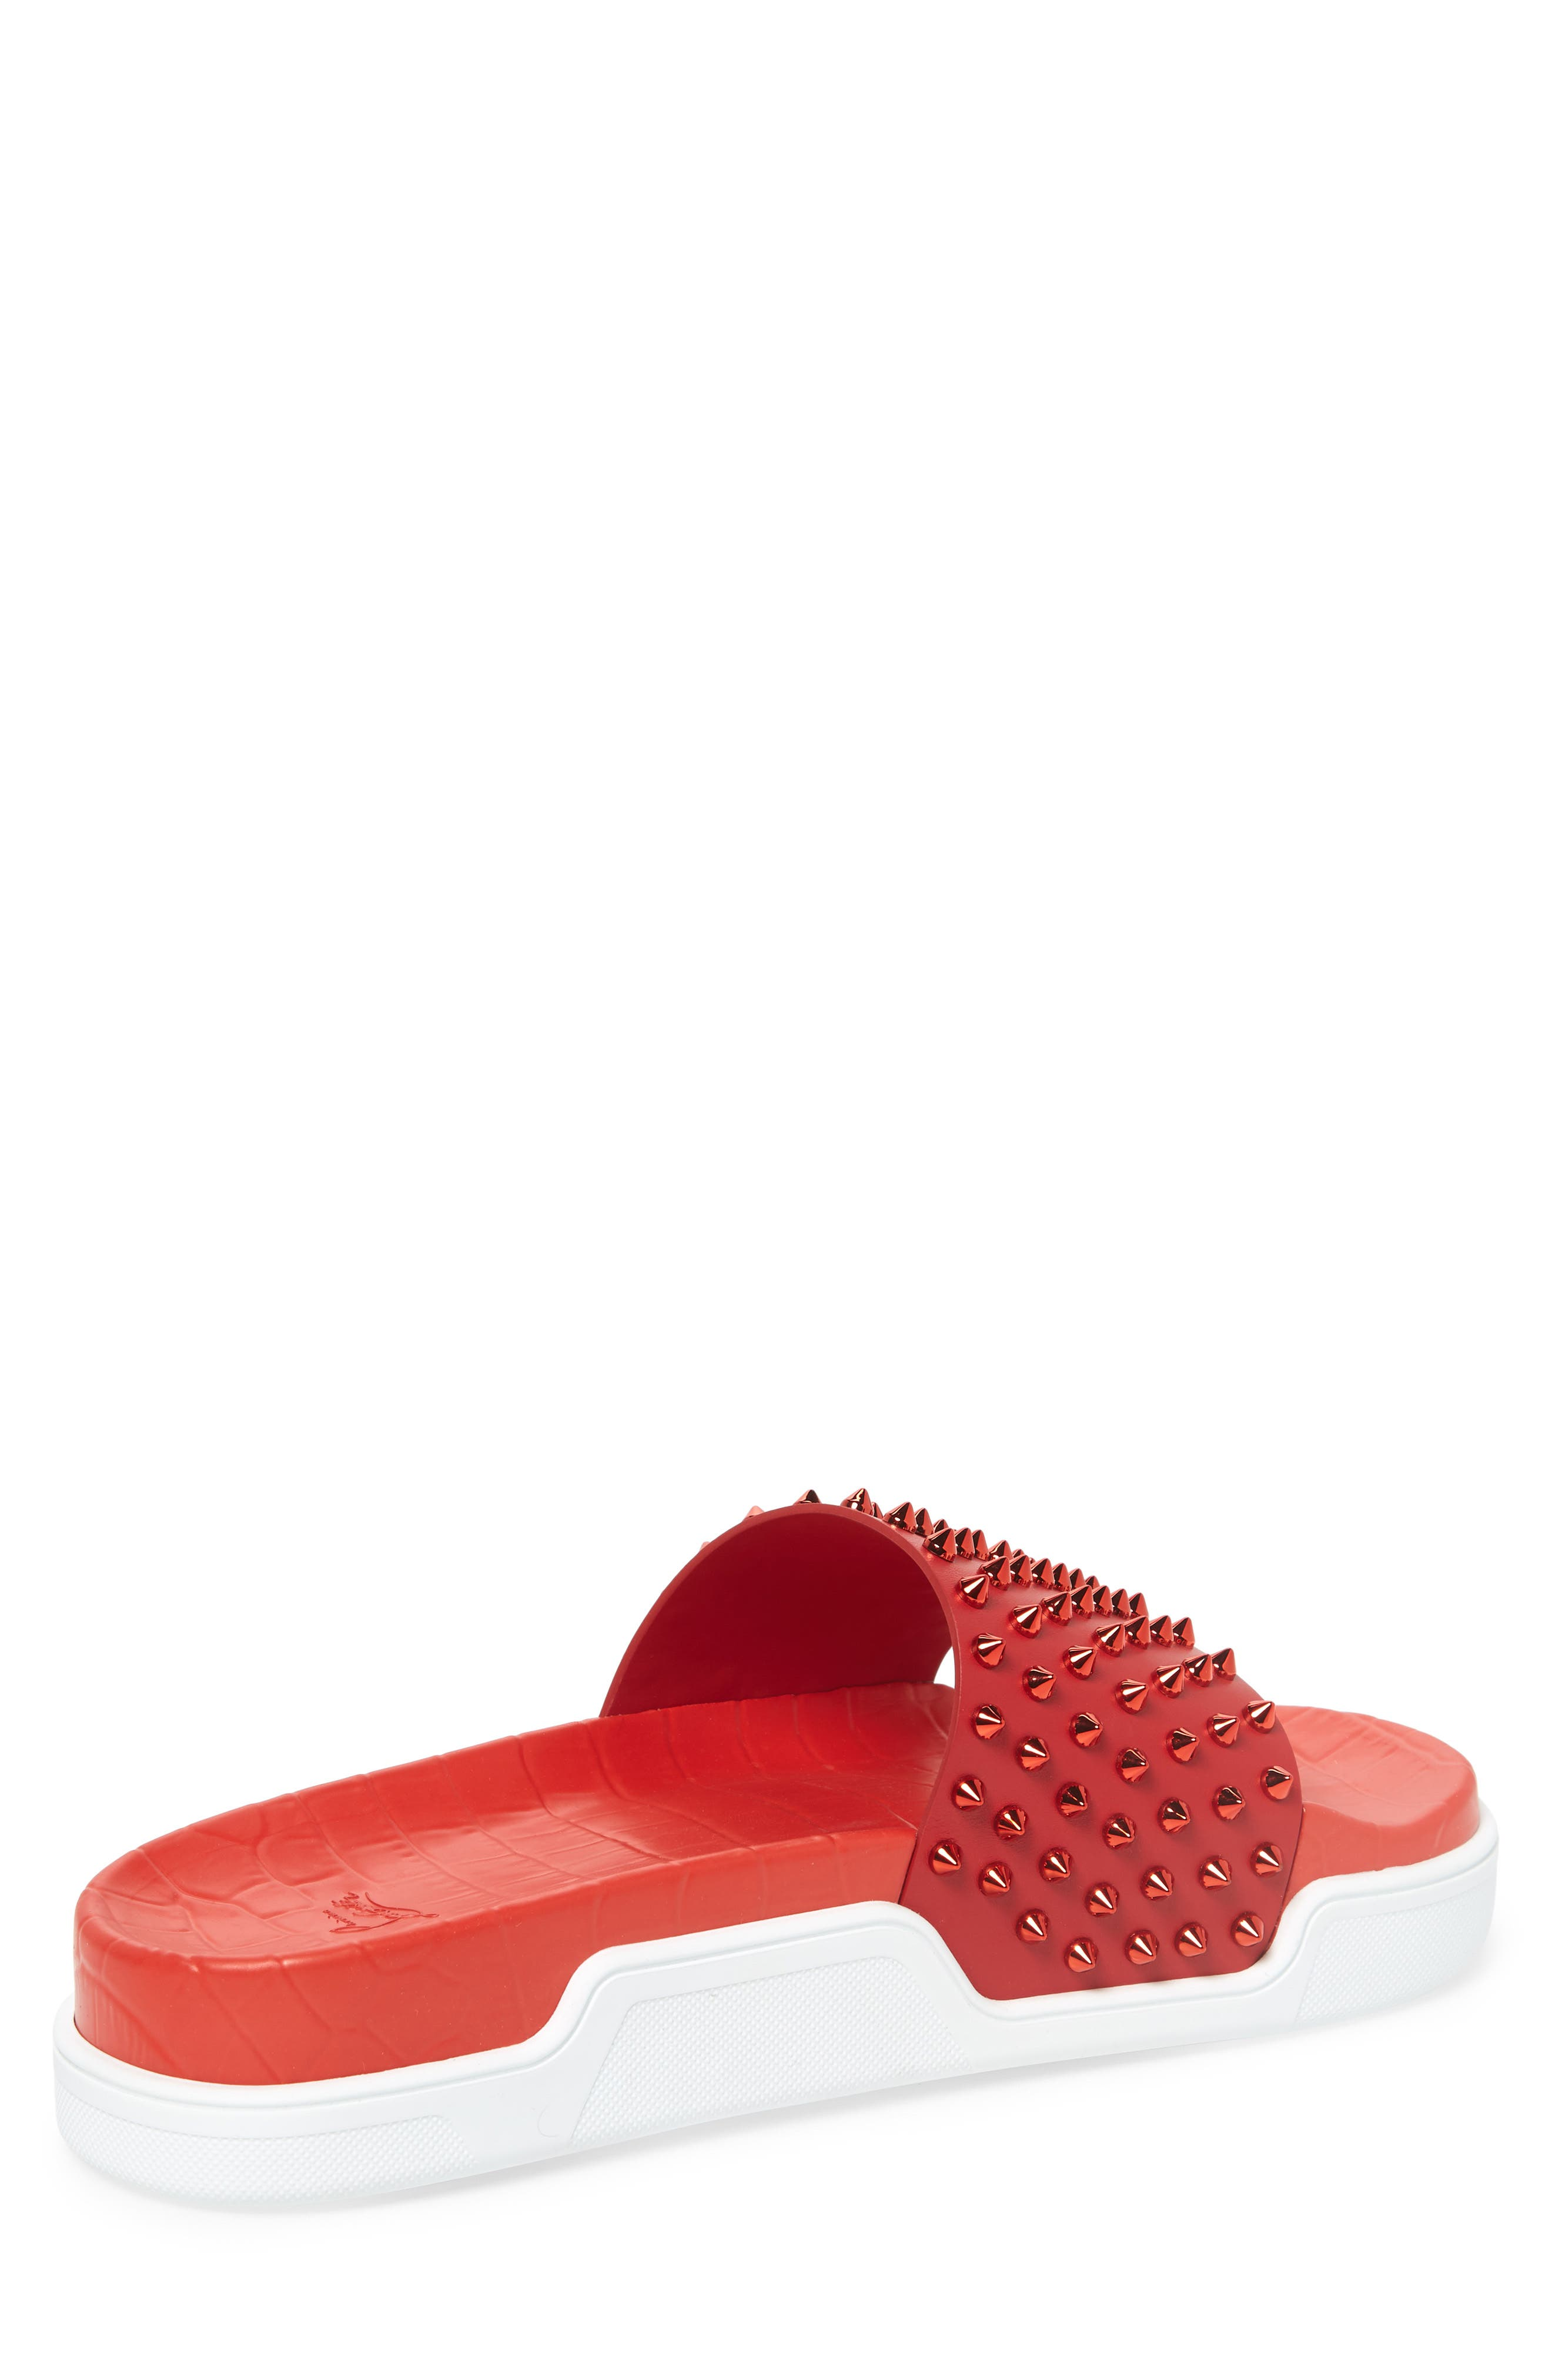 promo code d51cf 282db Men's Christian Louboutin Shoes | Nordstrom